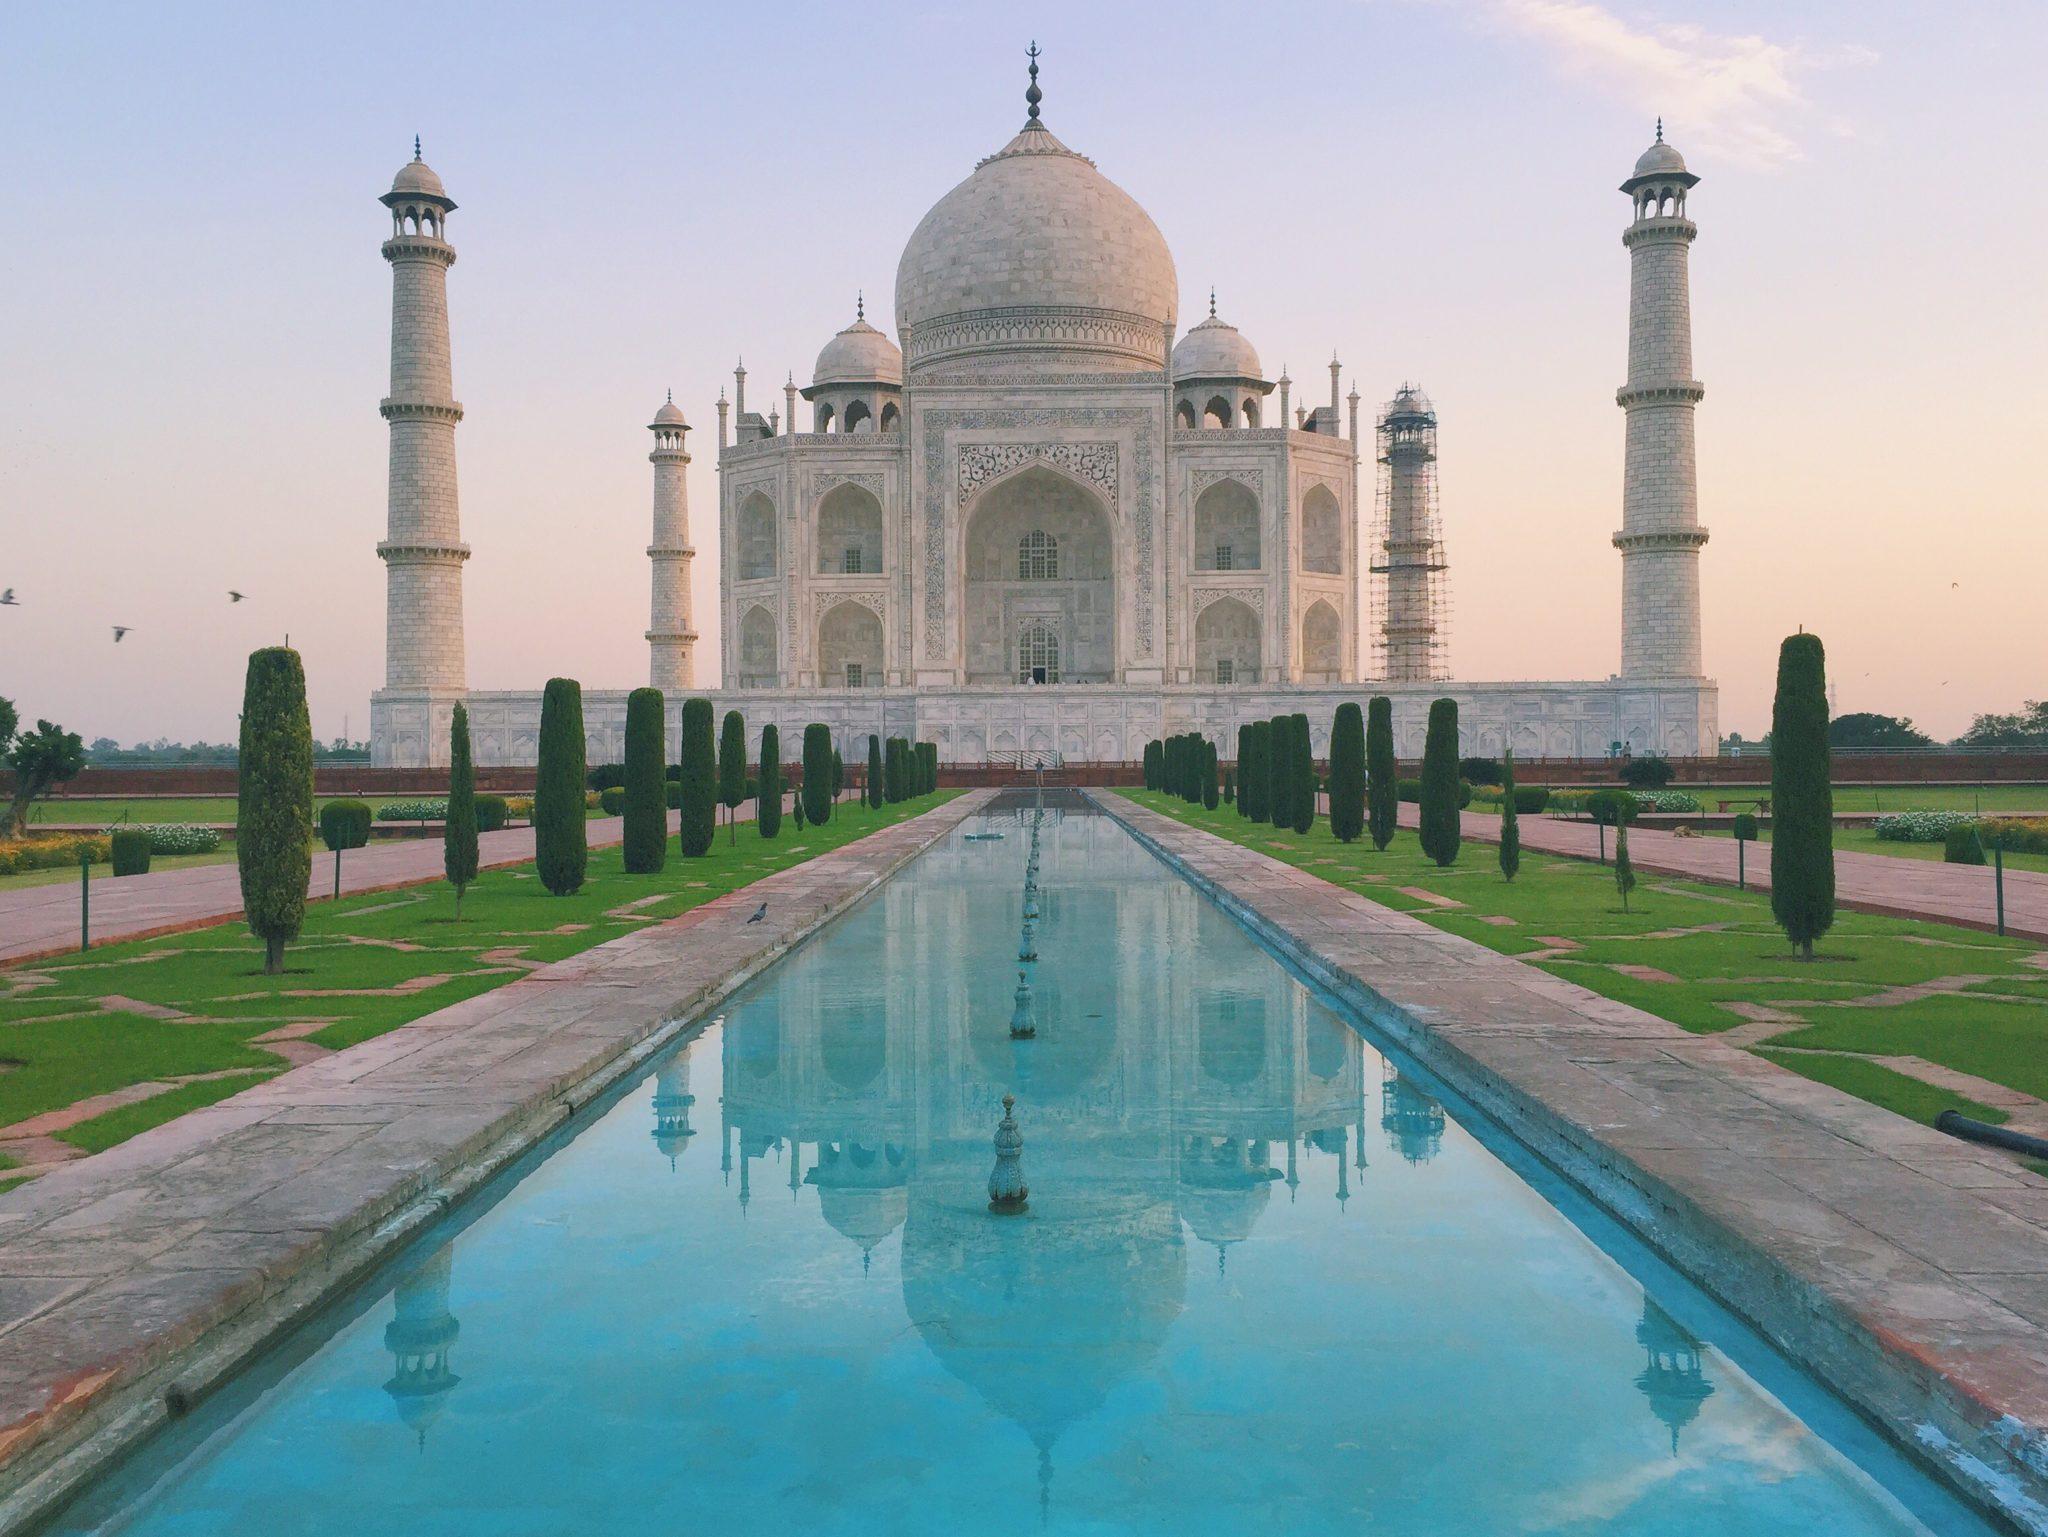 Tips on photographing the Taj Mahal | WORLD OF WANDERLUST